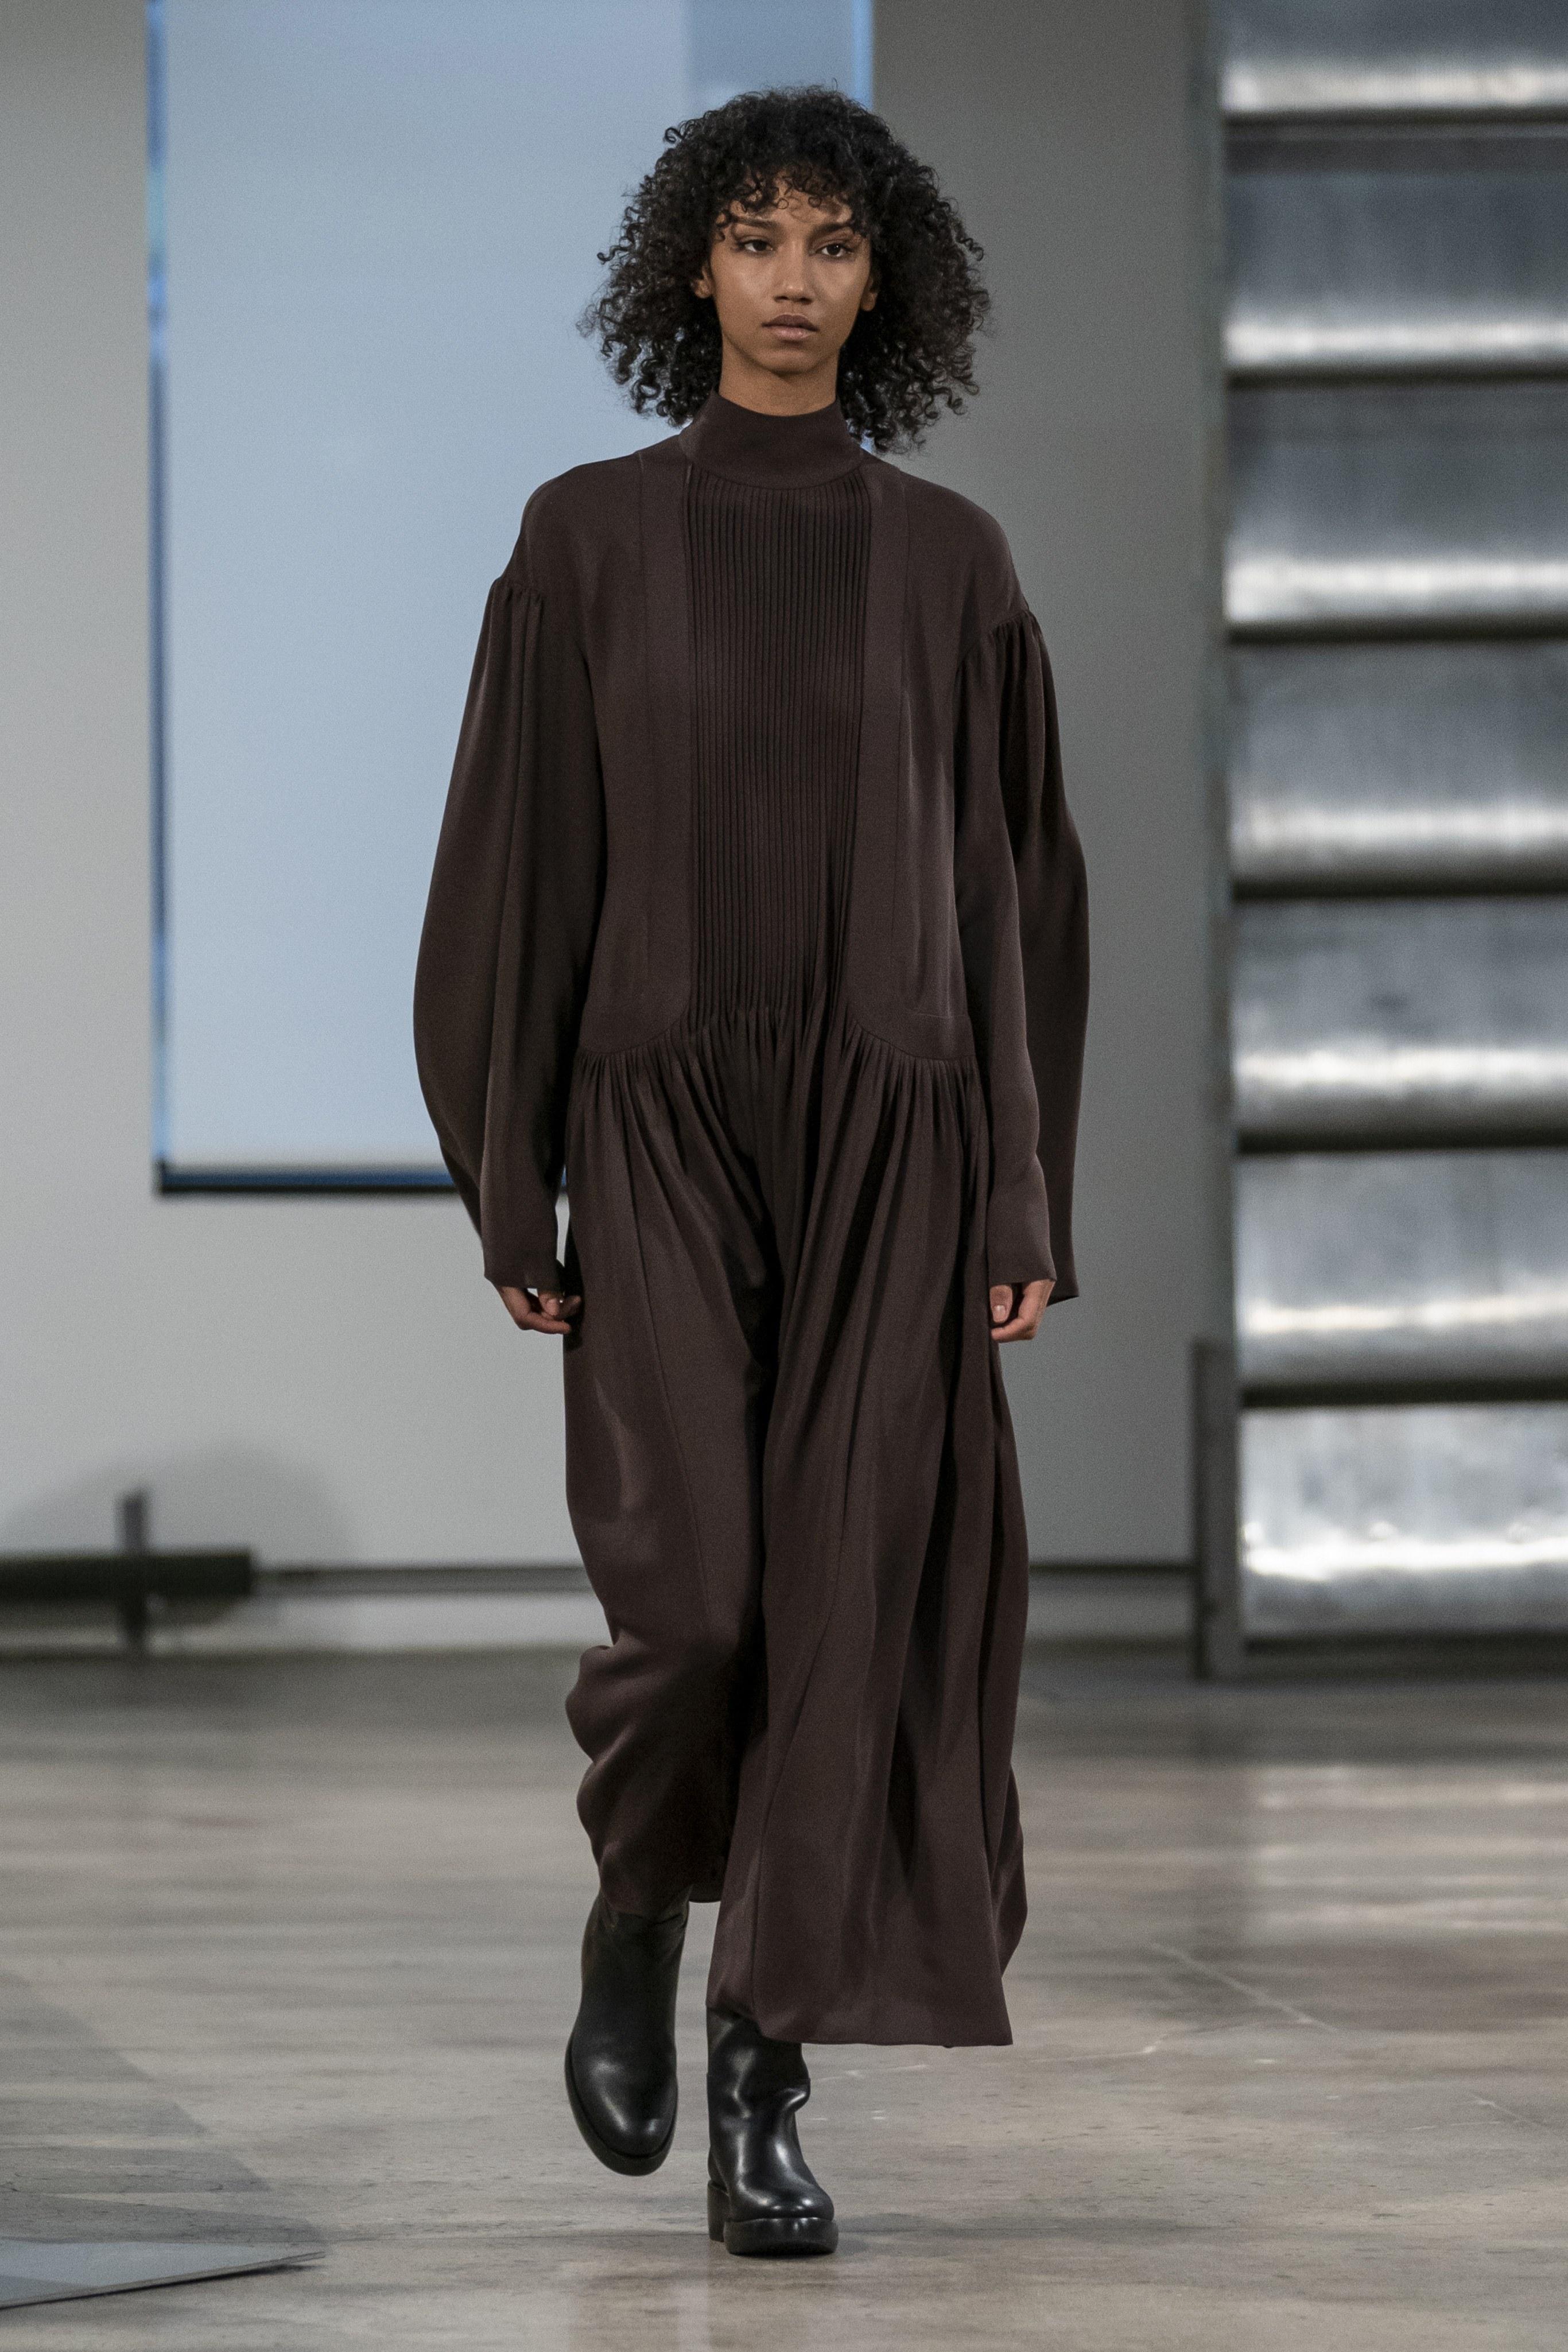 00017-The-Row-Fall-2019-ready-to-wear